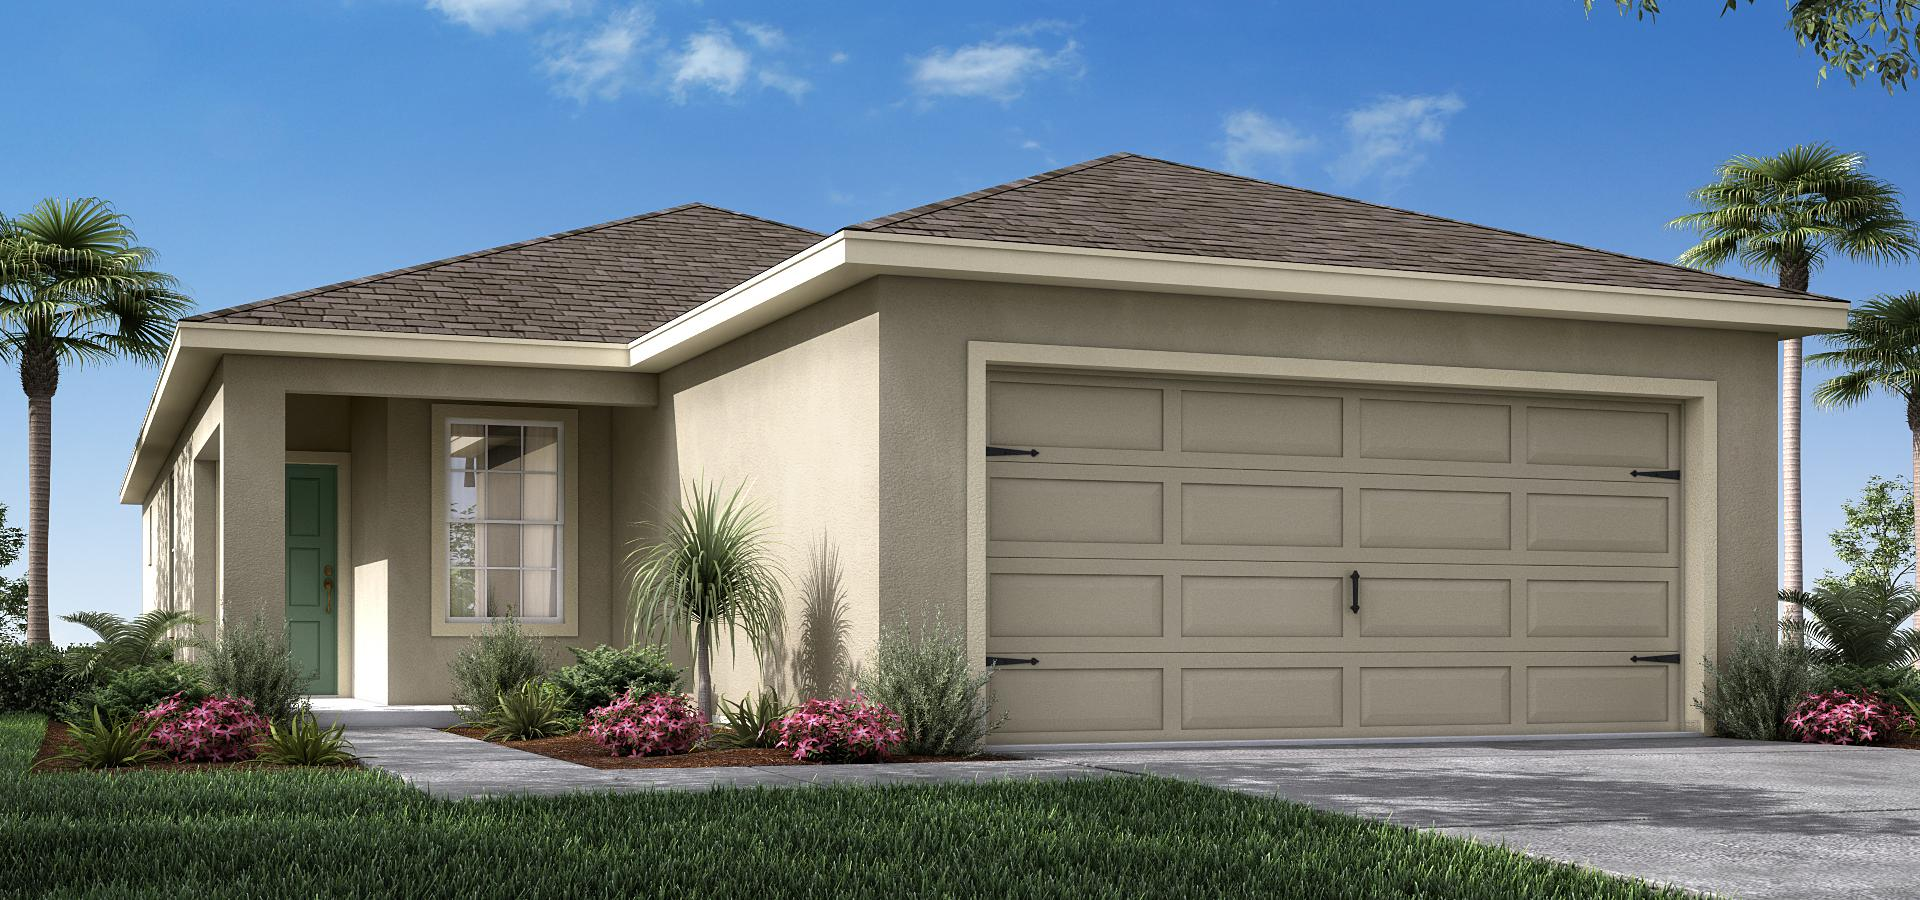 Ridgewood West New Home Community Riverview Florida